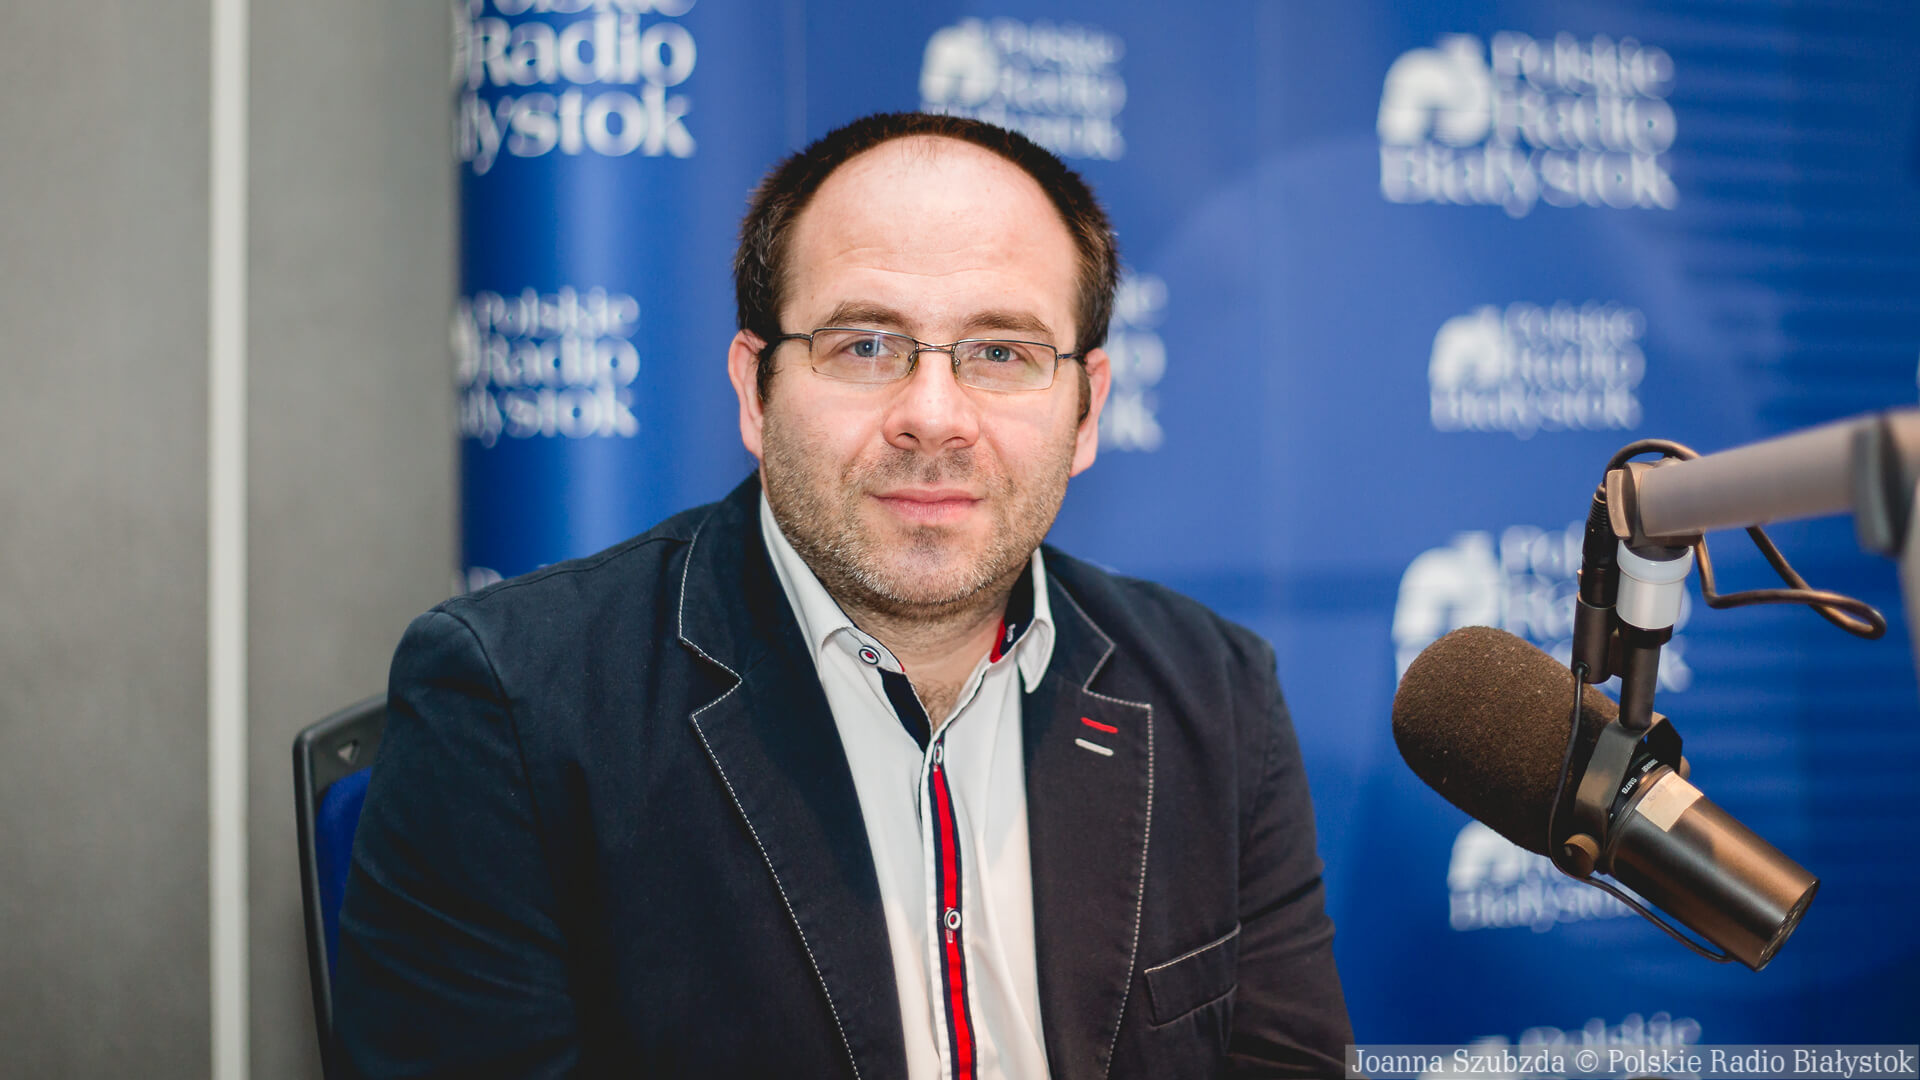 Piotr Półtorak, fot. Joanna Szubzda